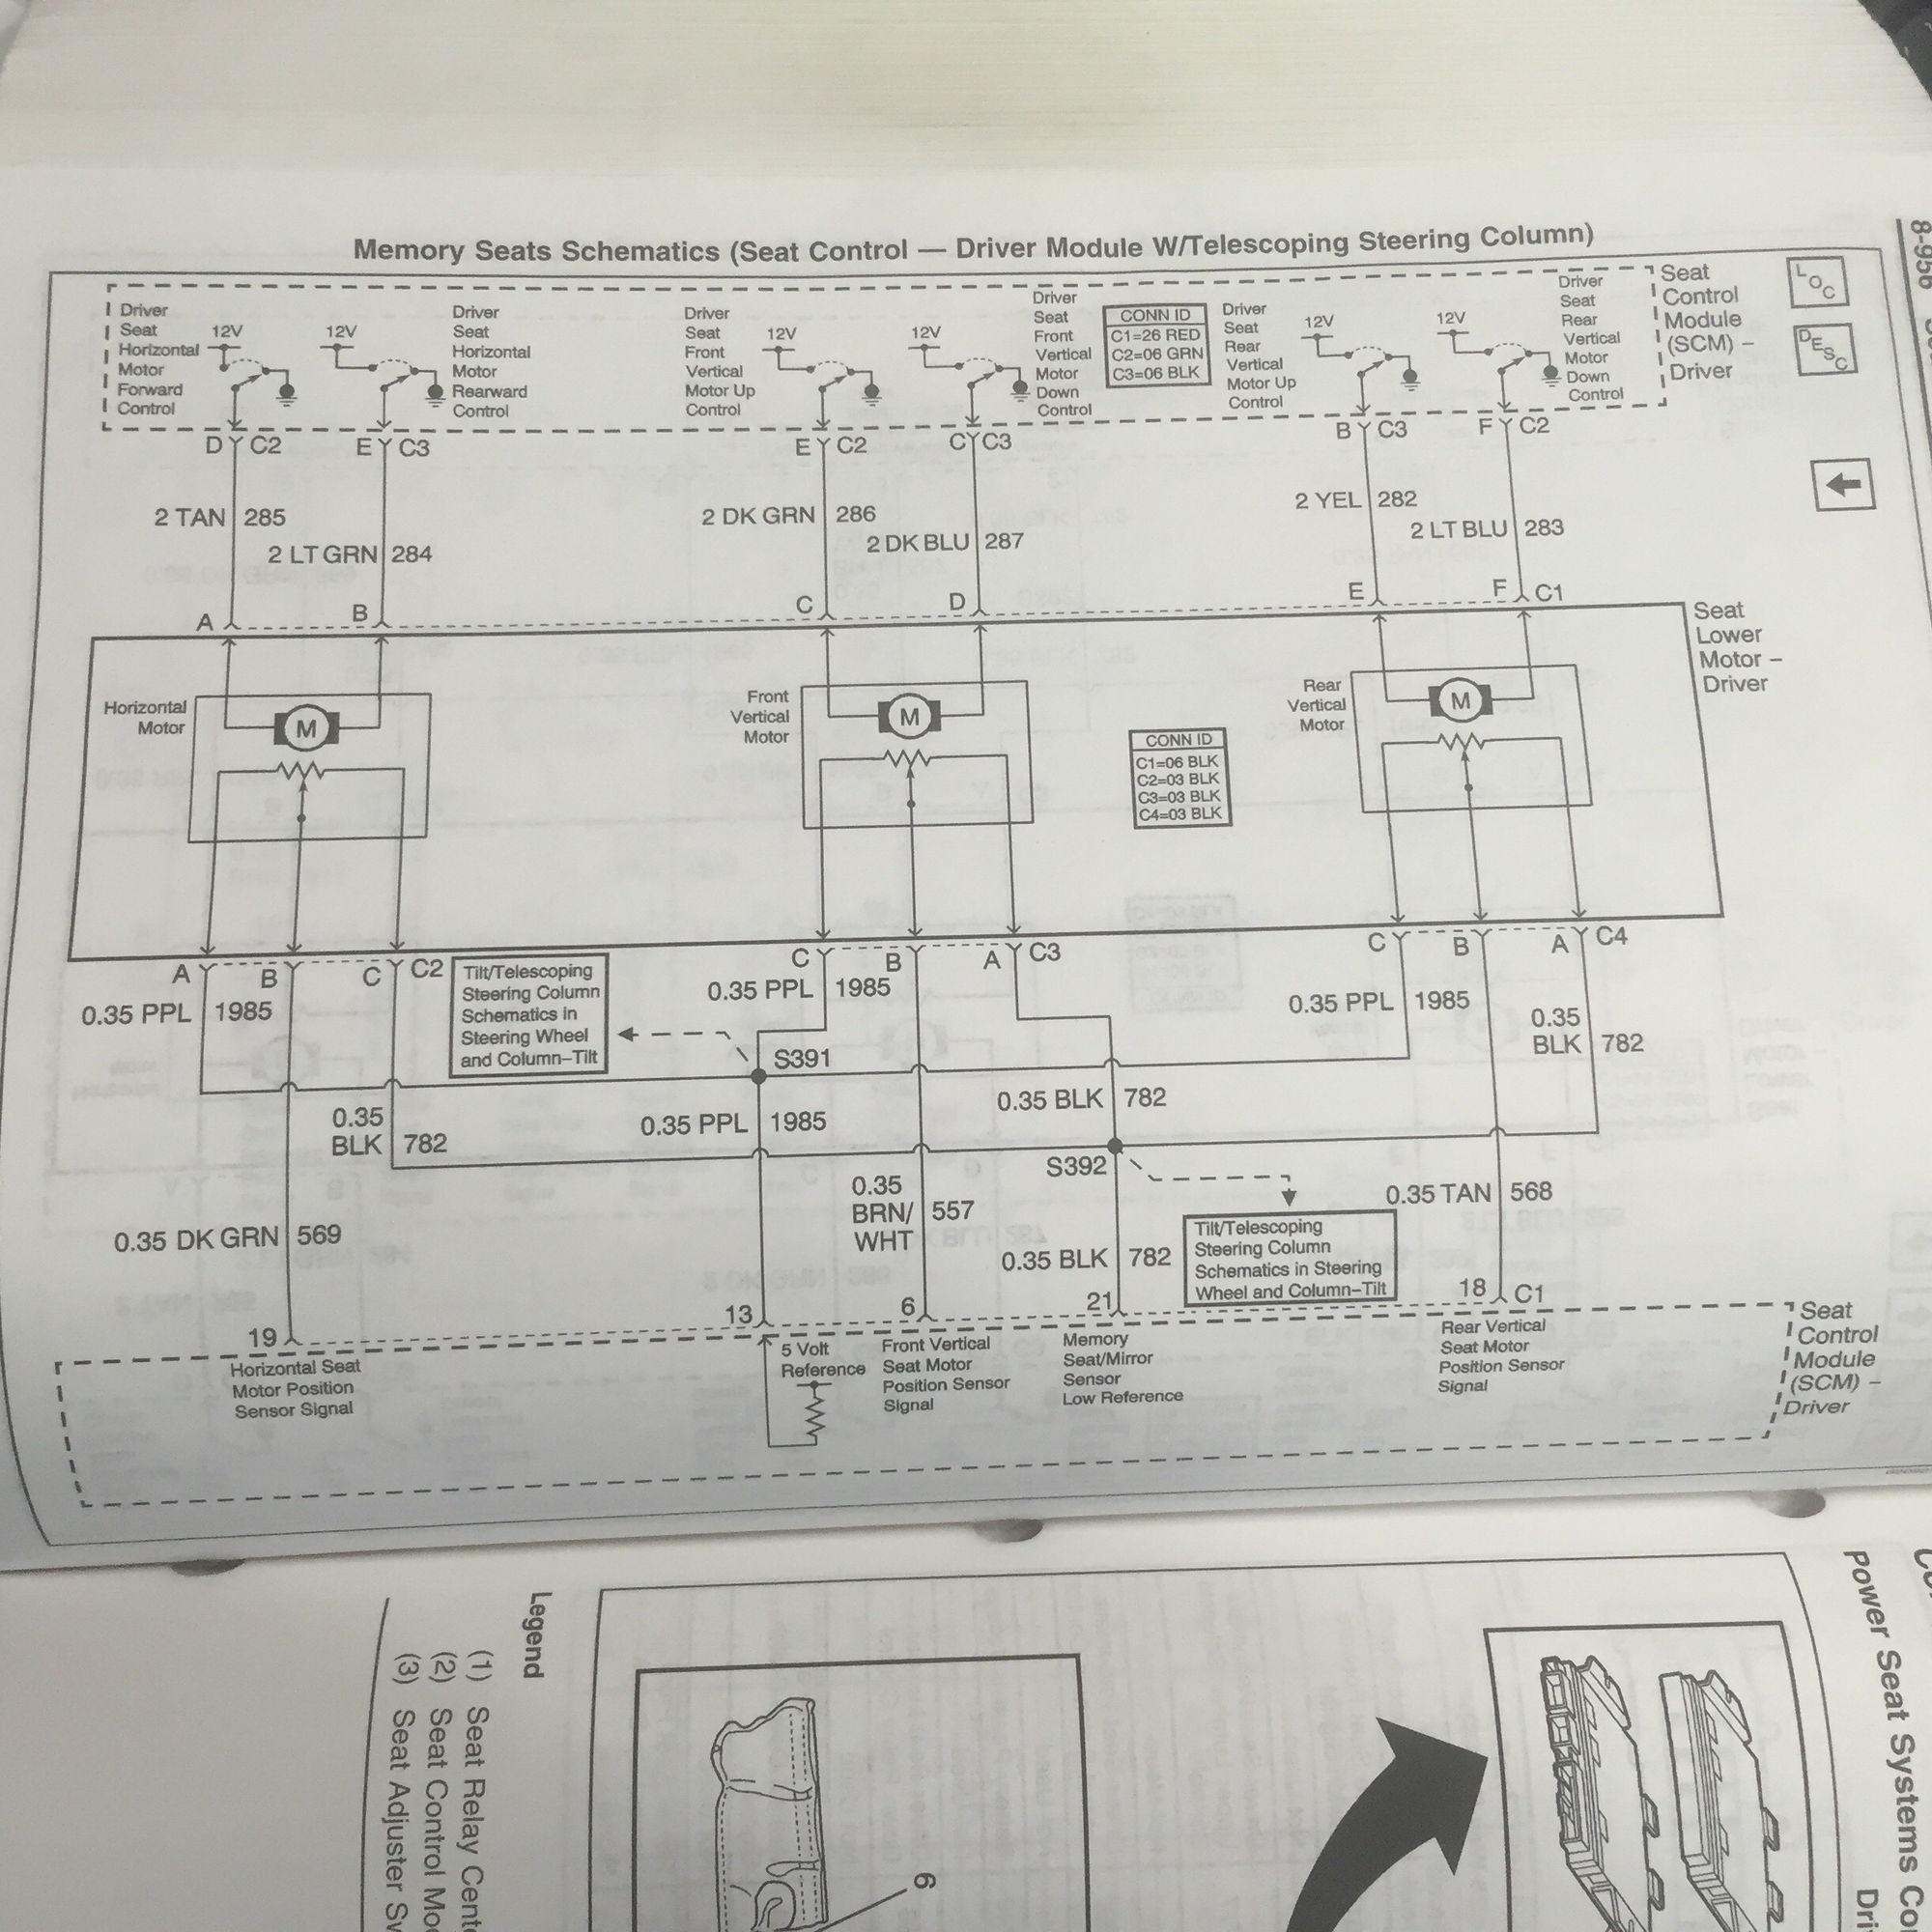 c5 corvette power seat wiring diagram snapper push mower parts corvetteforum chevrolet